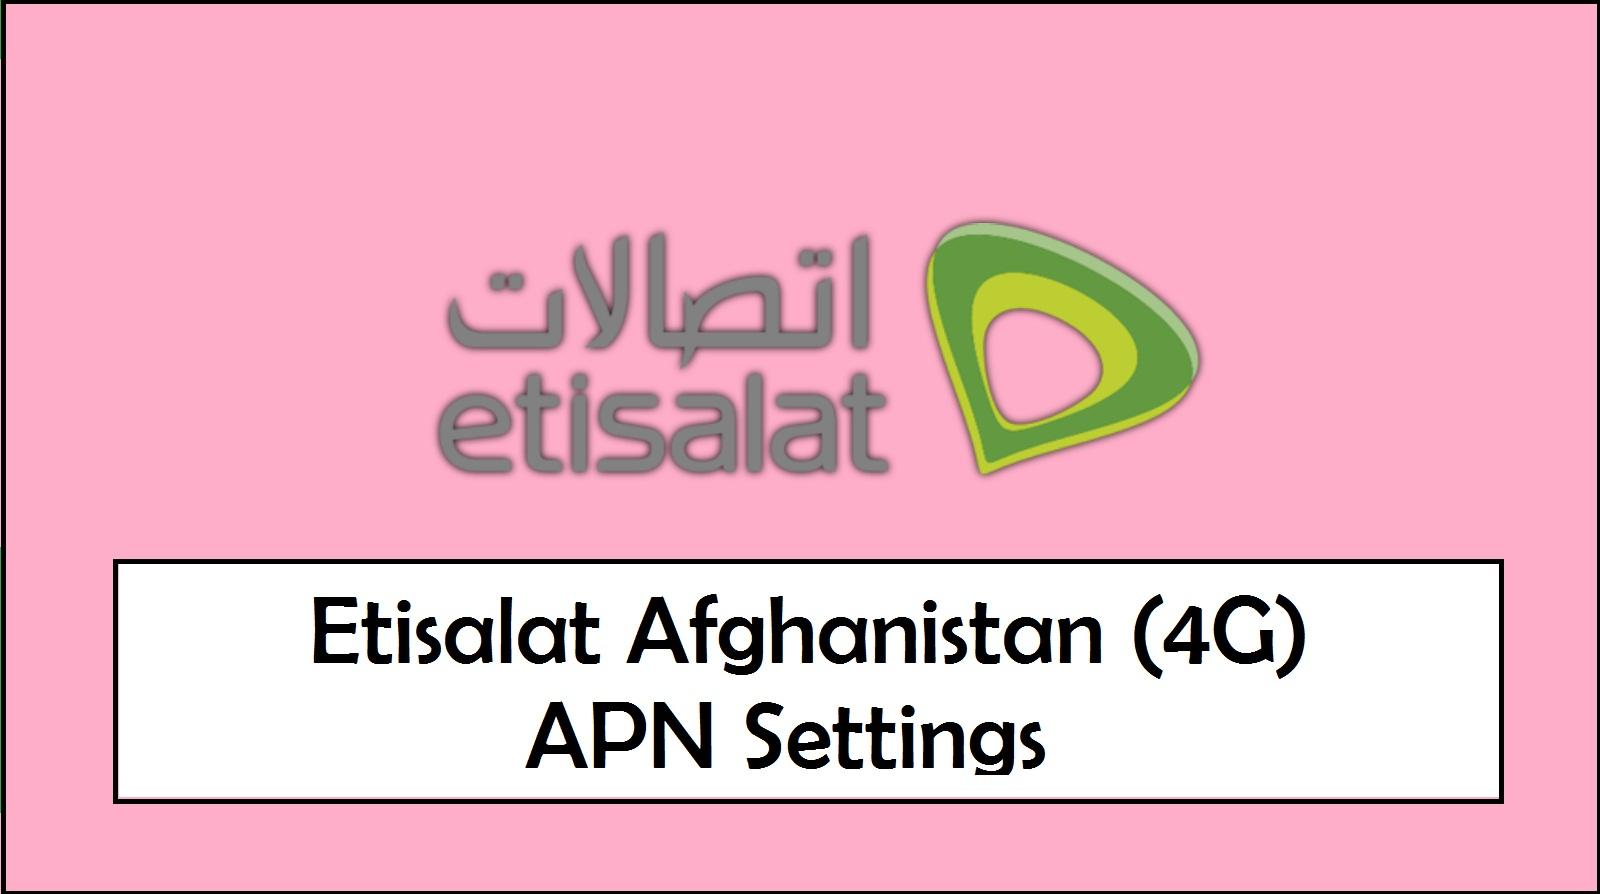 Etisalat Afghanistan APN Settings